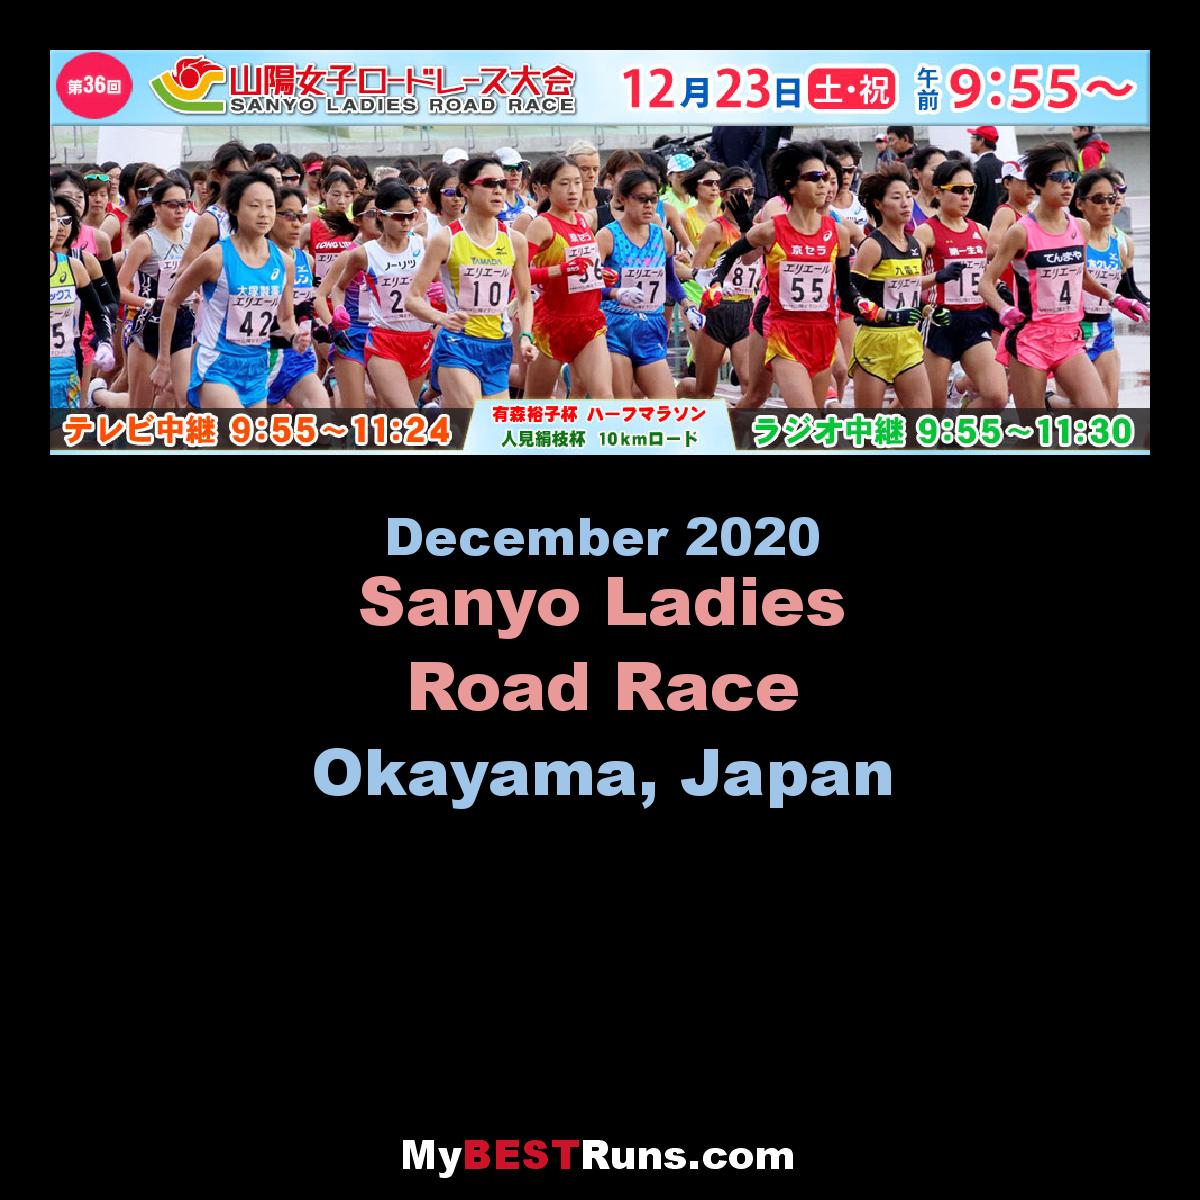 Sanyo Ladies Road Race